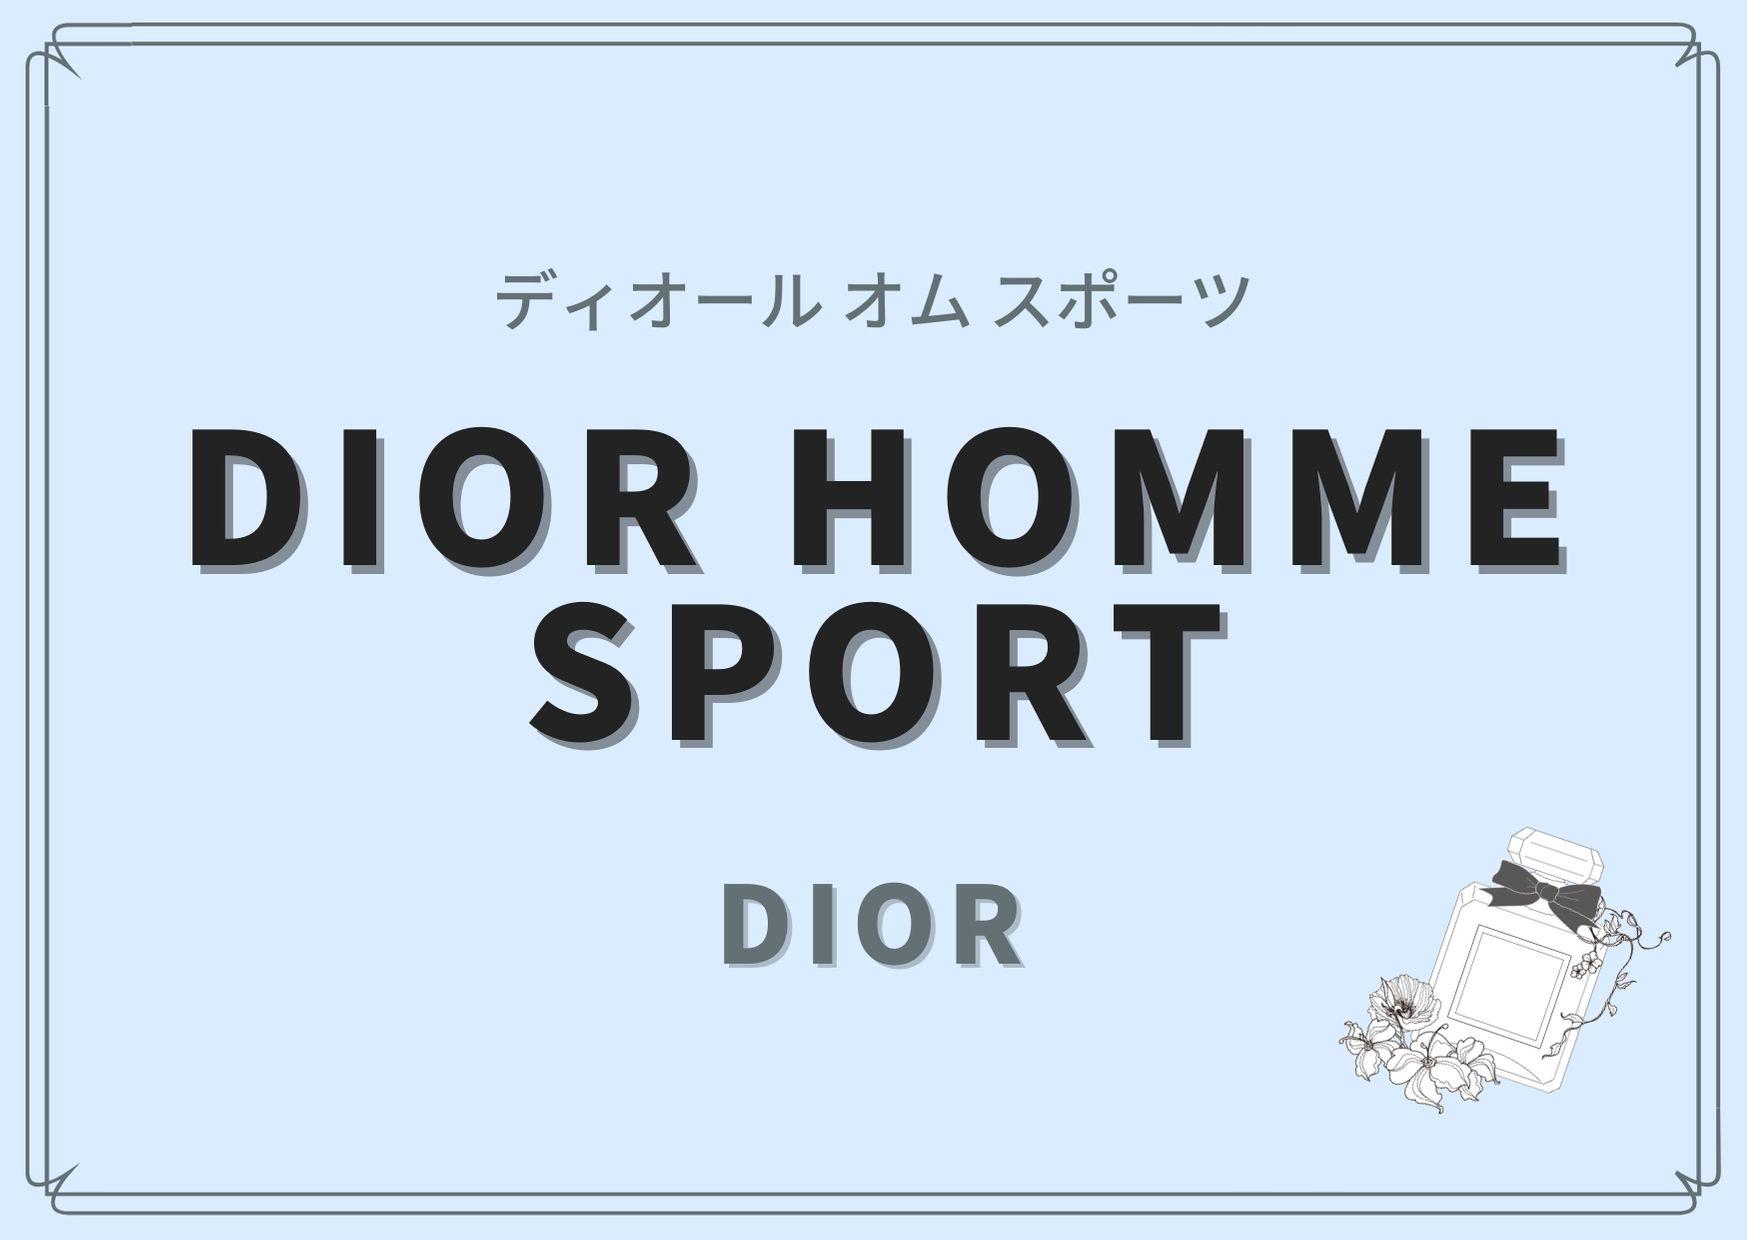 DIOR HOMME SPORT(ディオール オム スポーツ)/DIOR(ディオール)